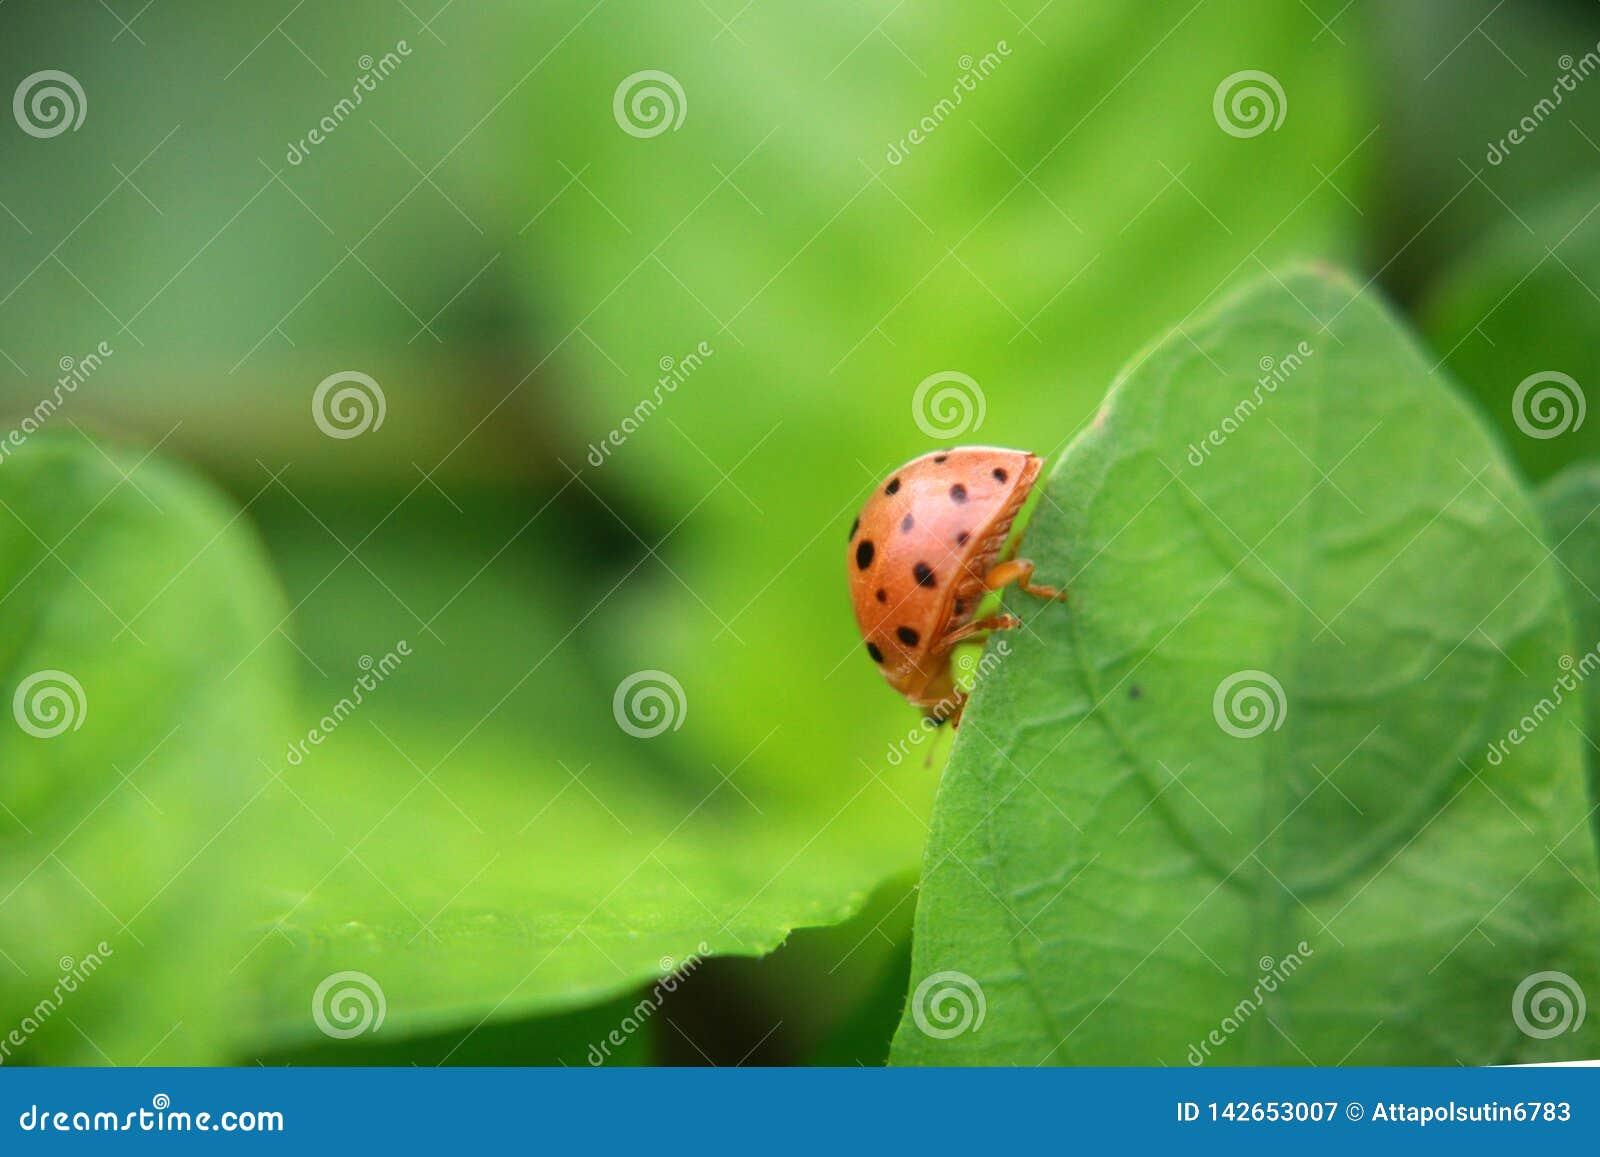 Joaninha na planta verde da folha, fim acima